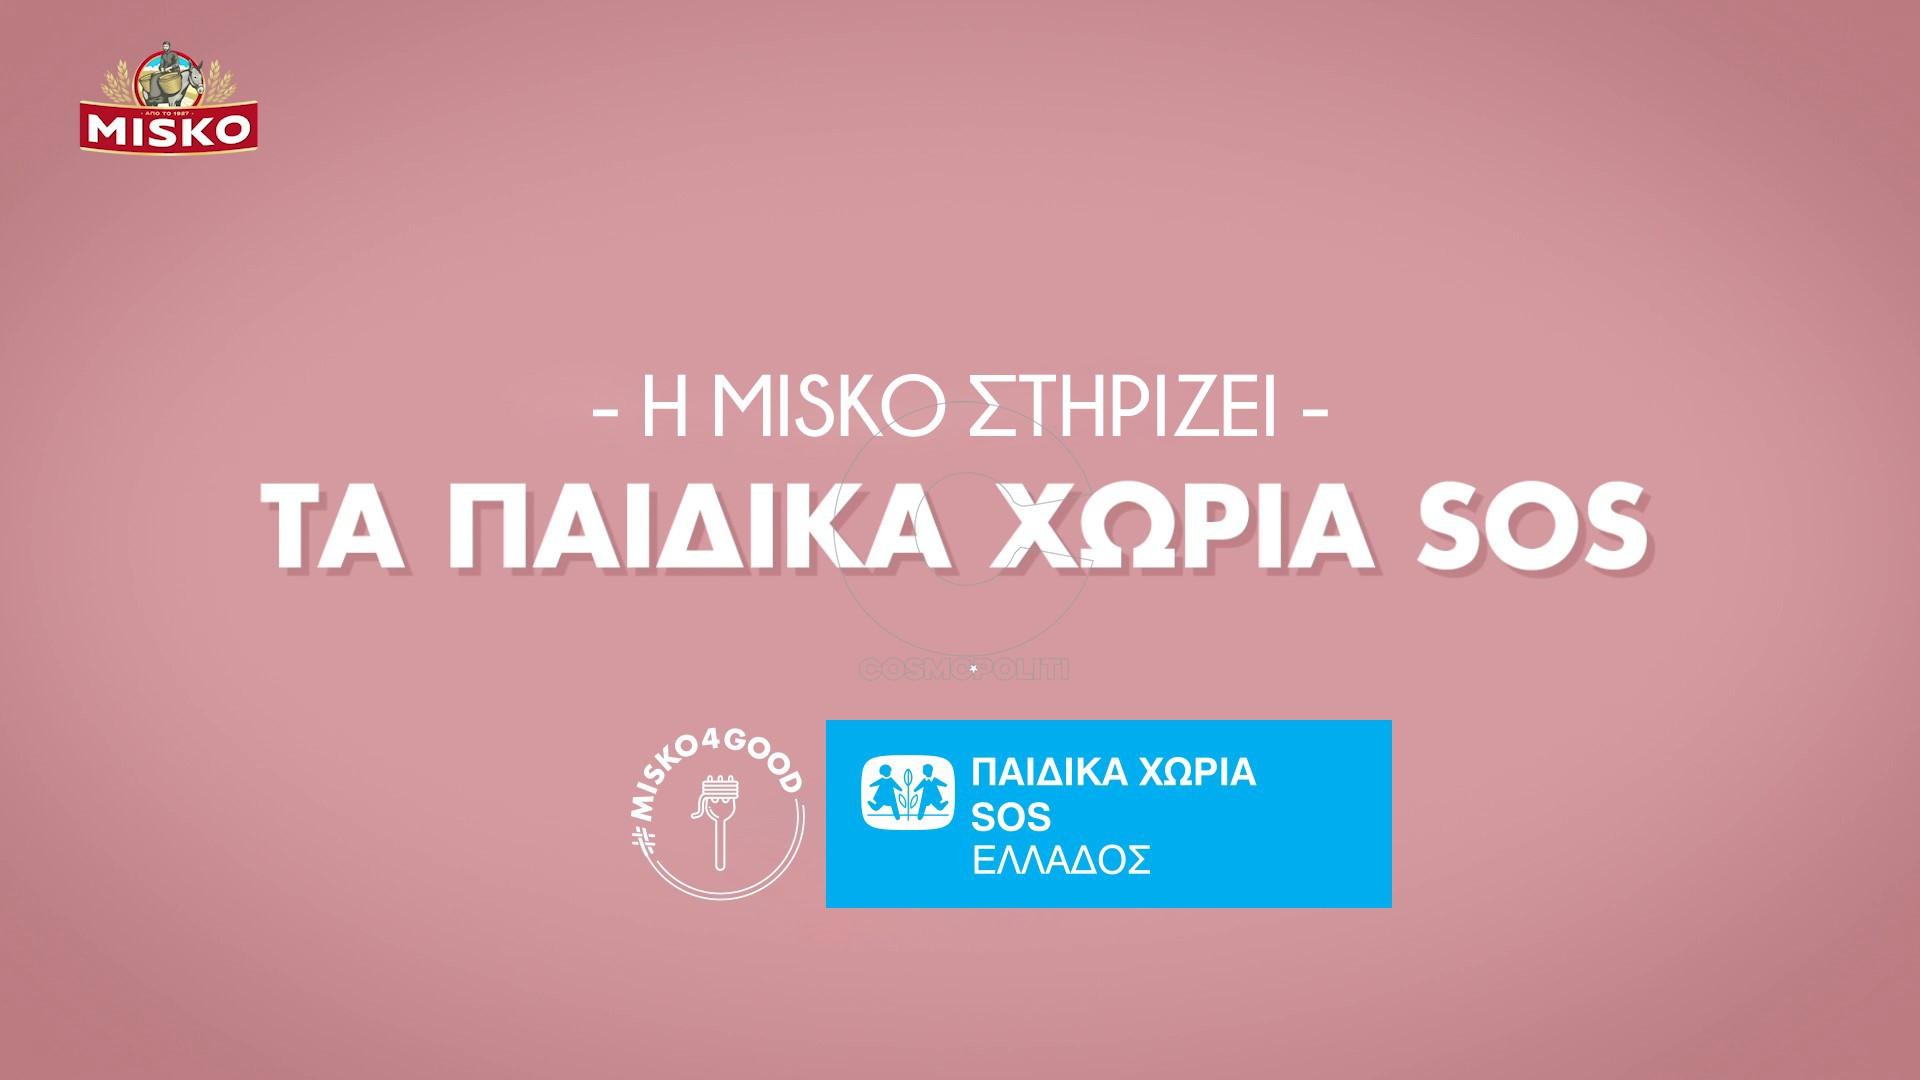 Misko4Good - Παιδικά Χωριά SOS